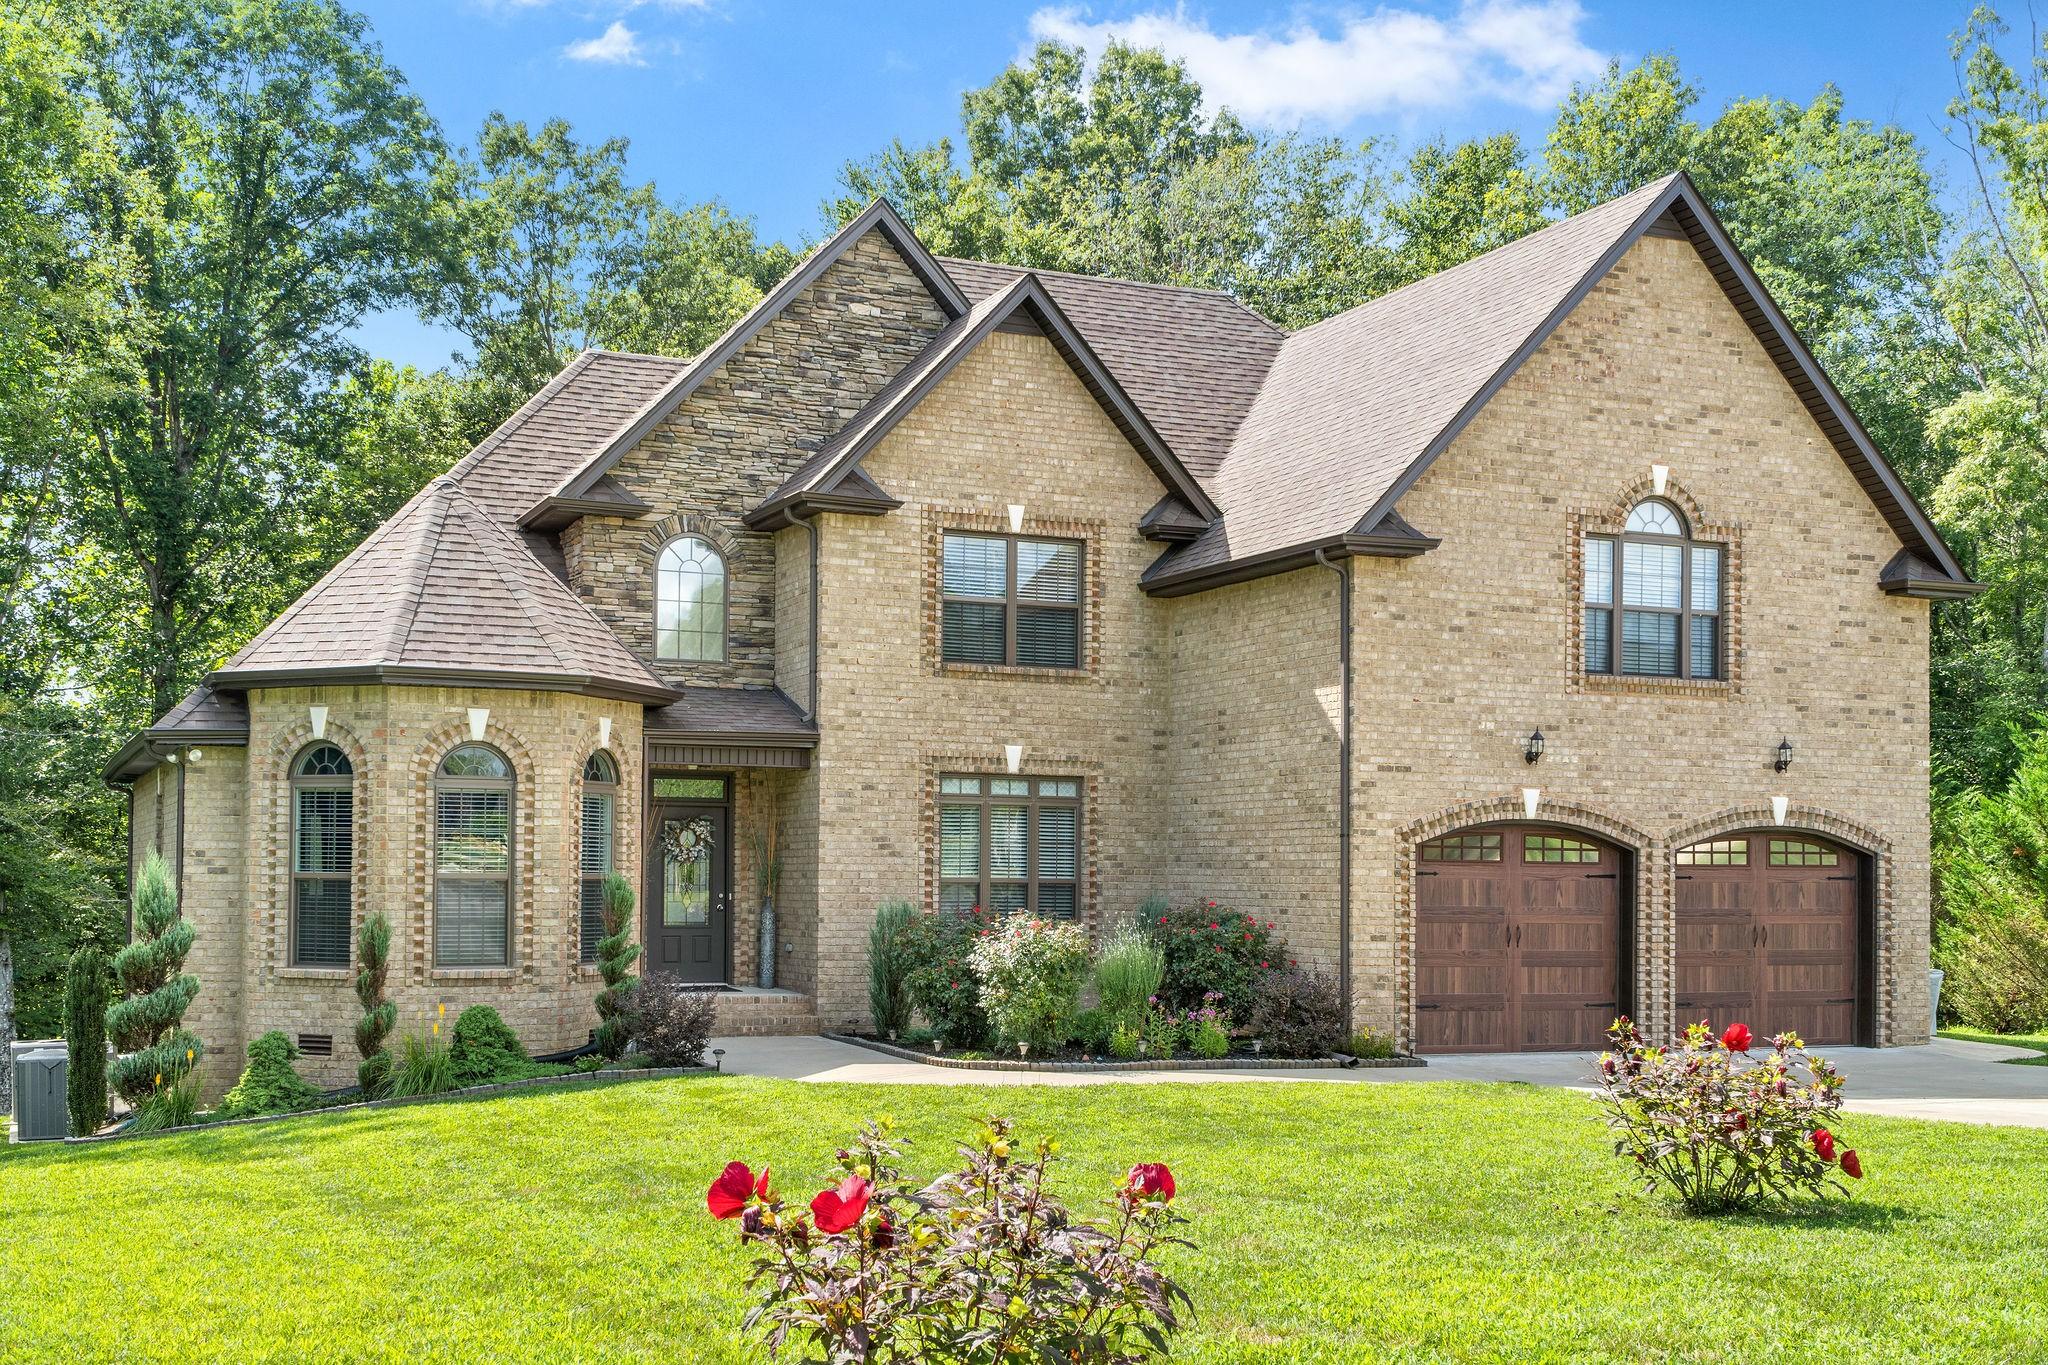 1630 Wonderboy Ct Property Photo - Clarksville, TN real estate listing